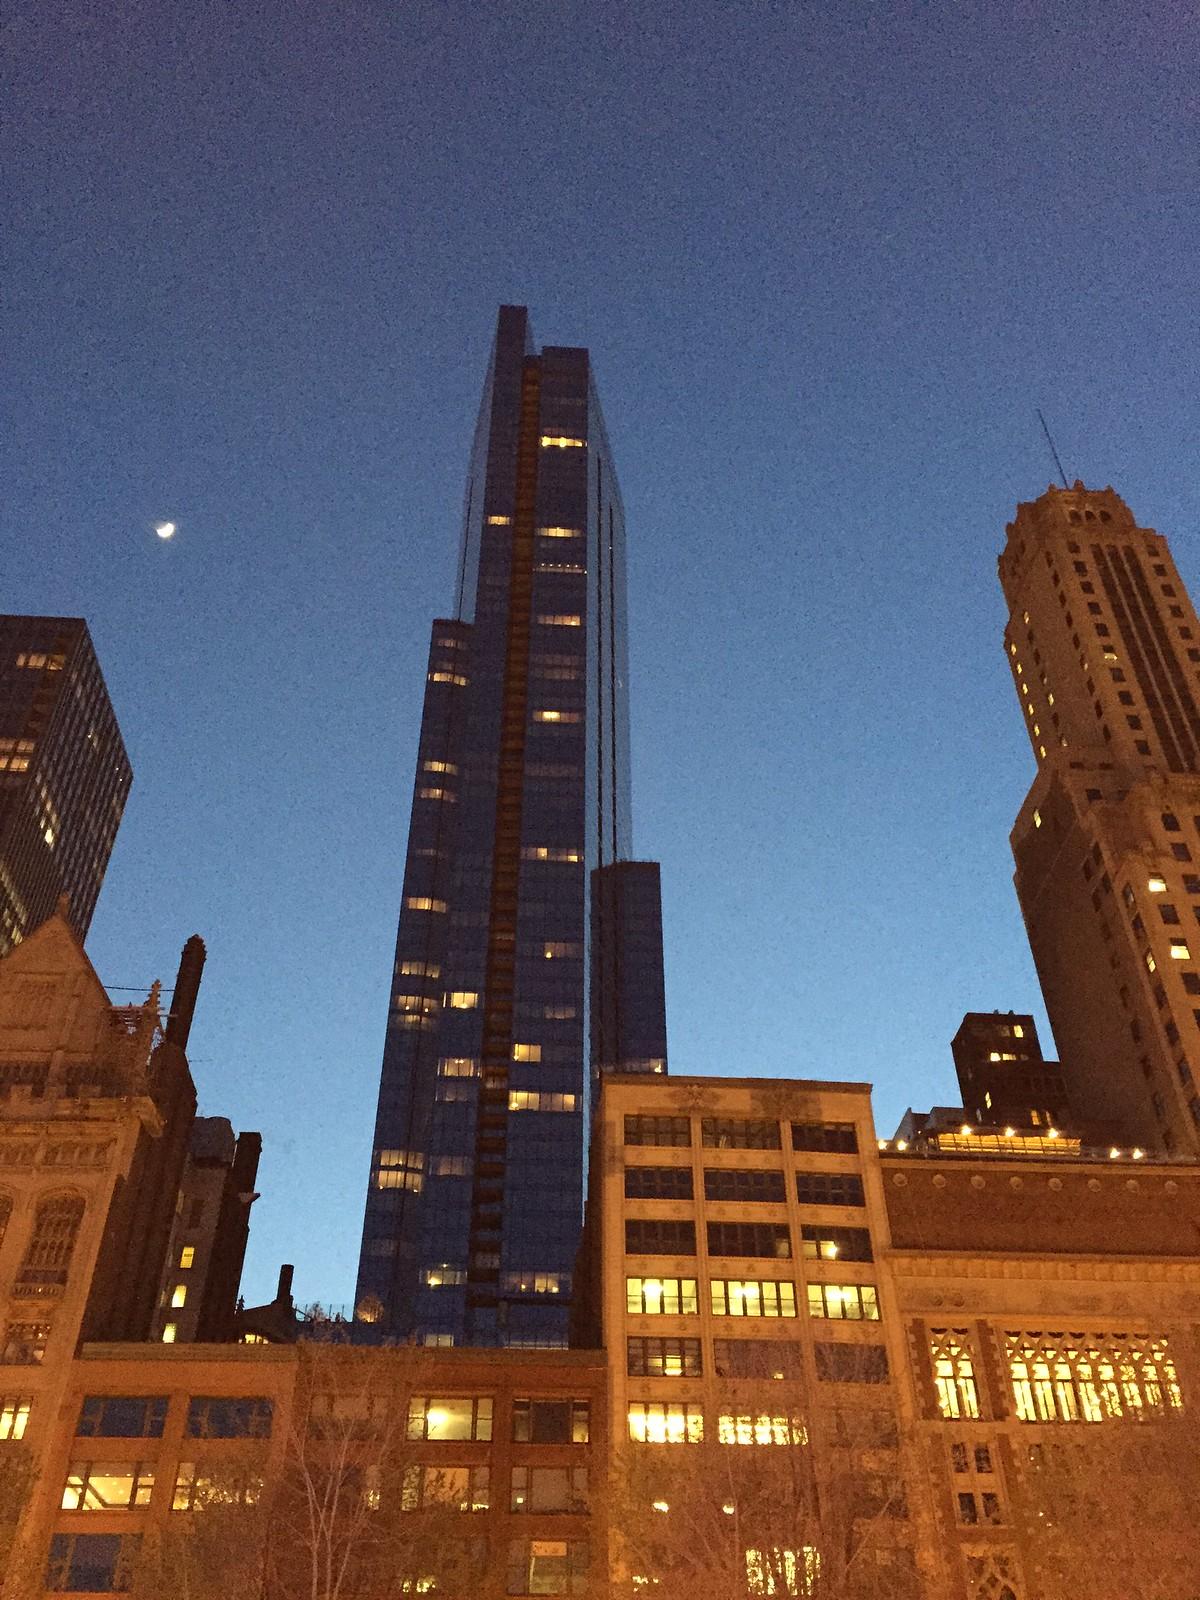 Chicago 23-04-2015 20-06-42